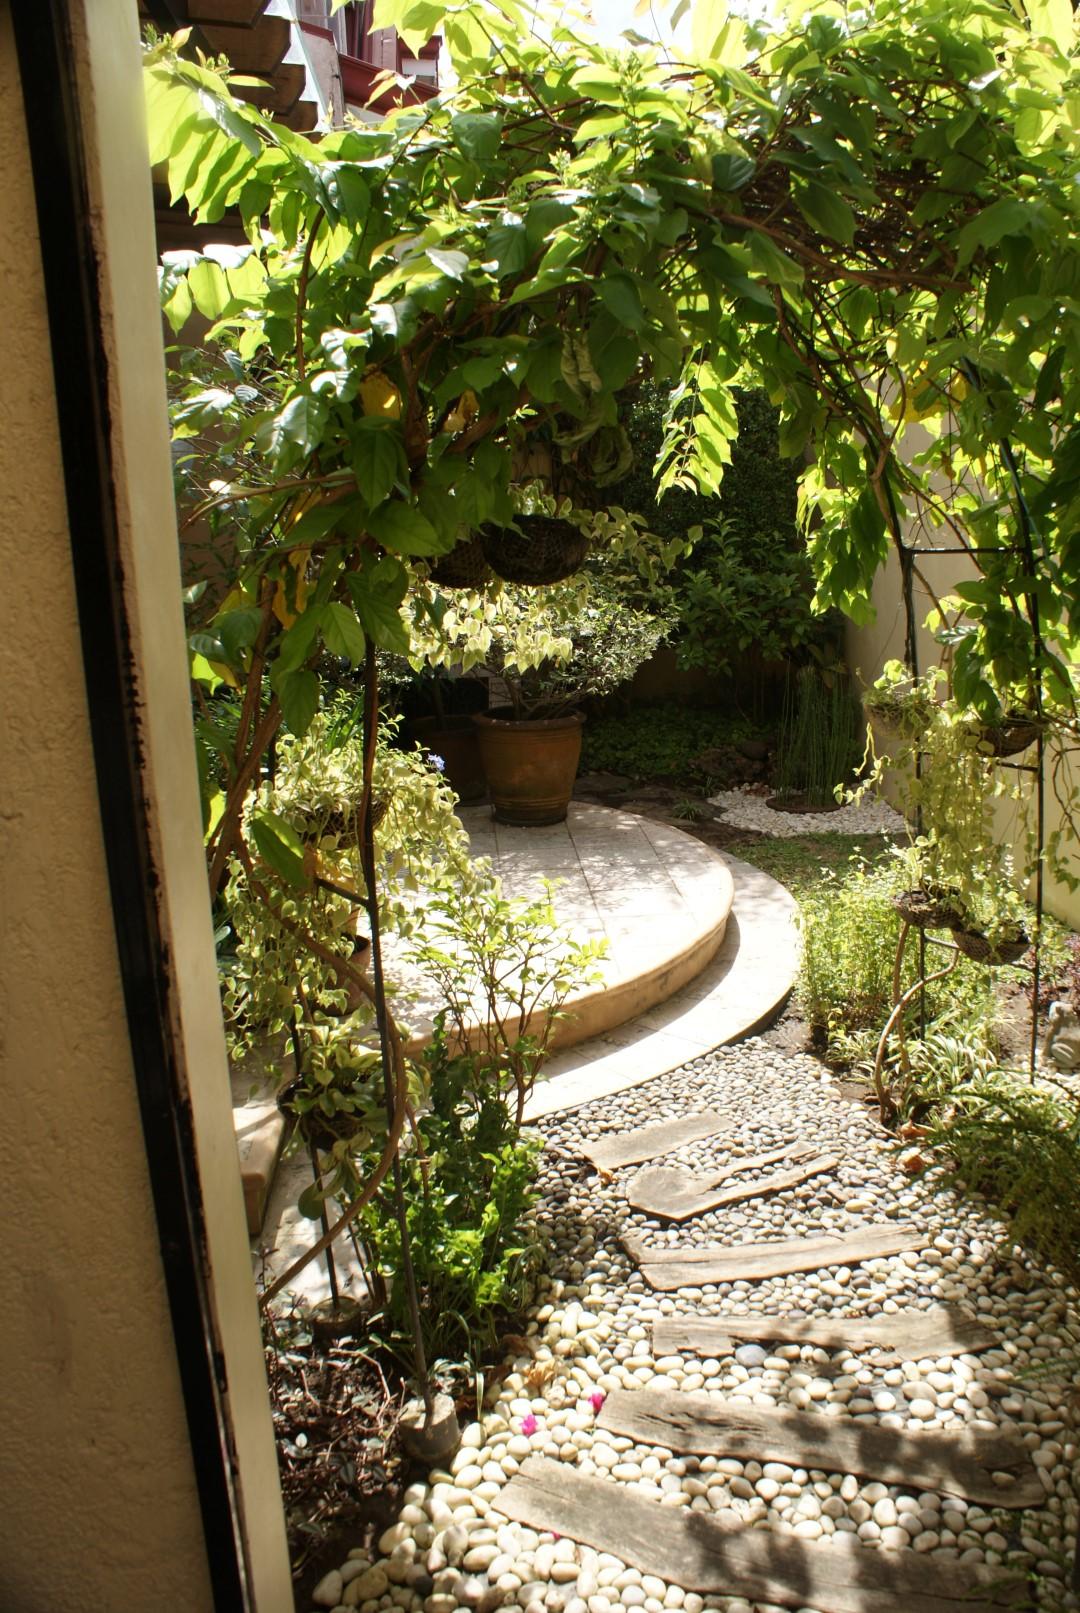 Raul's tropical garden in the Phillipines - FineGardening